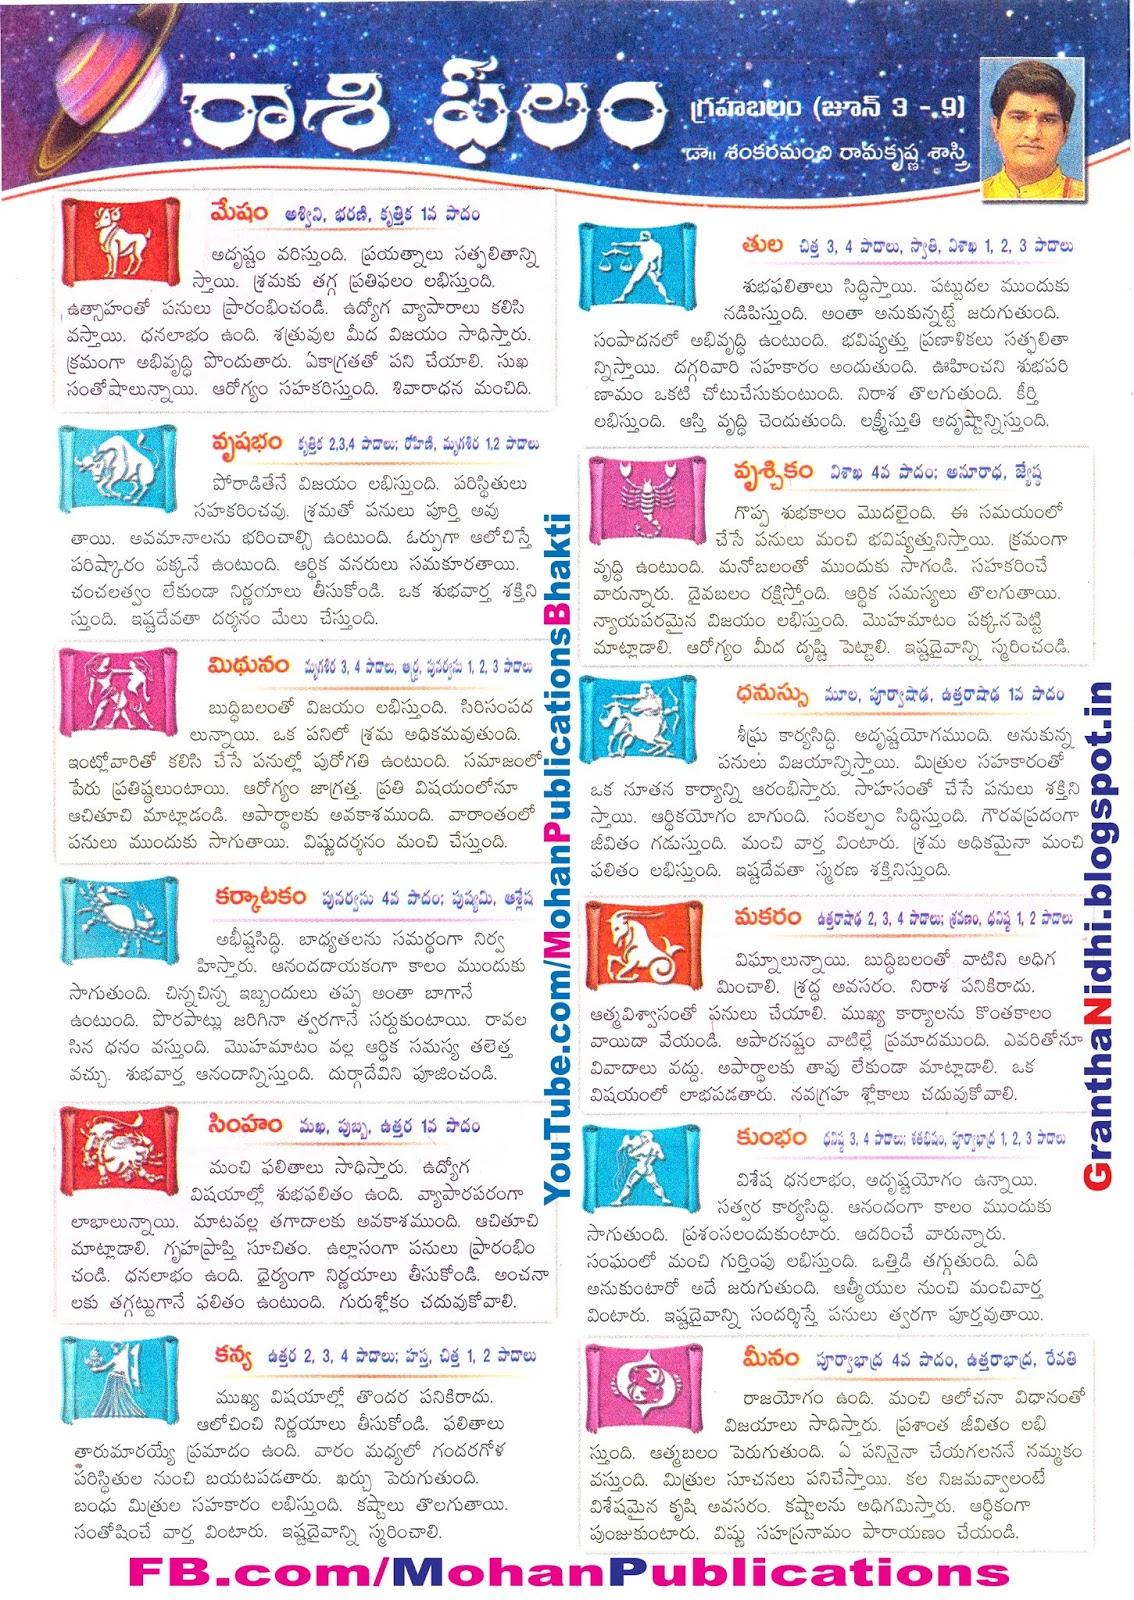 sankaramanchi ramakrishna sastry rasi phalalu weekly sankaramanchi ramakrishna Grahabalam RasiPhalalu Sunday-Magazine Eenadu.net EenaduEpaper EenaduSunday BhakthiPustakalu Bhakthi Pustakalu Bhakti Pustakalu BhaktiPustakalu  మేషం (అశ్విని, భరణి, కృత్తిక 1వ పాదం) వృషభం (కృత్తిక 2,3,4 పాదాలు; రోహిణి, మృగశిర 1,2 పాదాలు) మిథునం  (మృగశిర 3, 4 పాదాలు, ఆర్ద్ర, పునర్వసు 1, 2, 3 పాదాలు) కర్కాటకం (పునర్వసు 4వ పాదం; పుష్యమి, ఆశ్లేష) సింహం (మఖ, పుబ్బ, ఉత్తర 1వ పాదం) కన్య   (ఉత్తర 2, 3, 4 పాదాలు; హస్త, చిత్త 1, 2 పాదాలు) తుల (చిత్త 3, 4 పాదాలు, స్వాతి, విశాఖ 1, 2, 3 పాదాలు) వృశ్చికం (విశాఖ 4వ పాదం; అనూరాధ, జ్యేష్ఠ) ధనుస్సు (మూల, పూర్వాషాఢ, ఉత్తరాషాఢ 1వ పాదం) మకరం  (ఉత్తరాషాఢ 2, 3, 4 పాదాలు; శ్రవణం, ధనిష్ట 1, 2 పాదాలు) కుంభం (ధనిష్ట 3, 4 పాదాలు; శతభిషం, పూర్వాభాద్ర 1, 2, 3 పాదాలు) మీనం (పూర్వాభాద్ర 4వ పాదం, ఉత్తరాభాద్ర, రేవతి